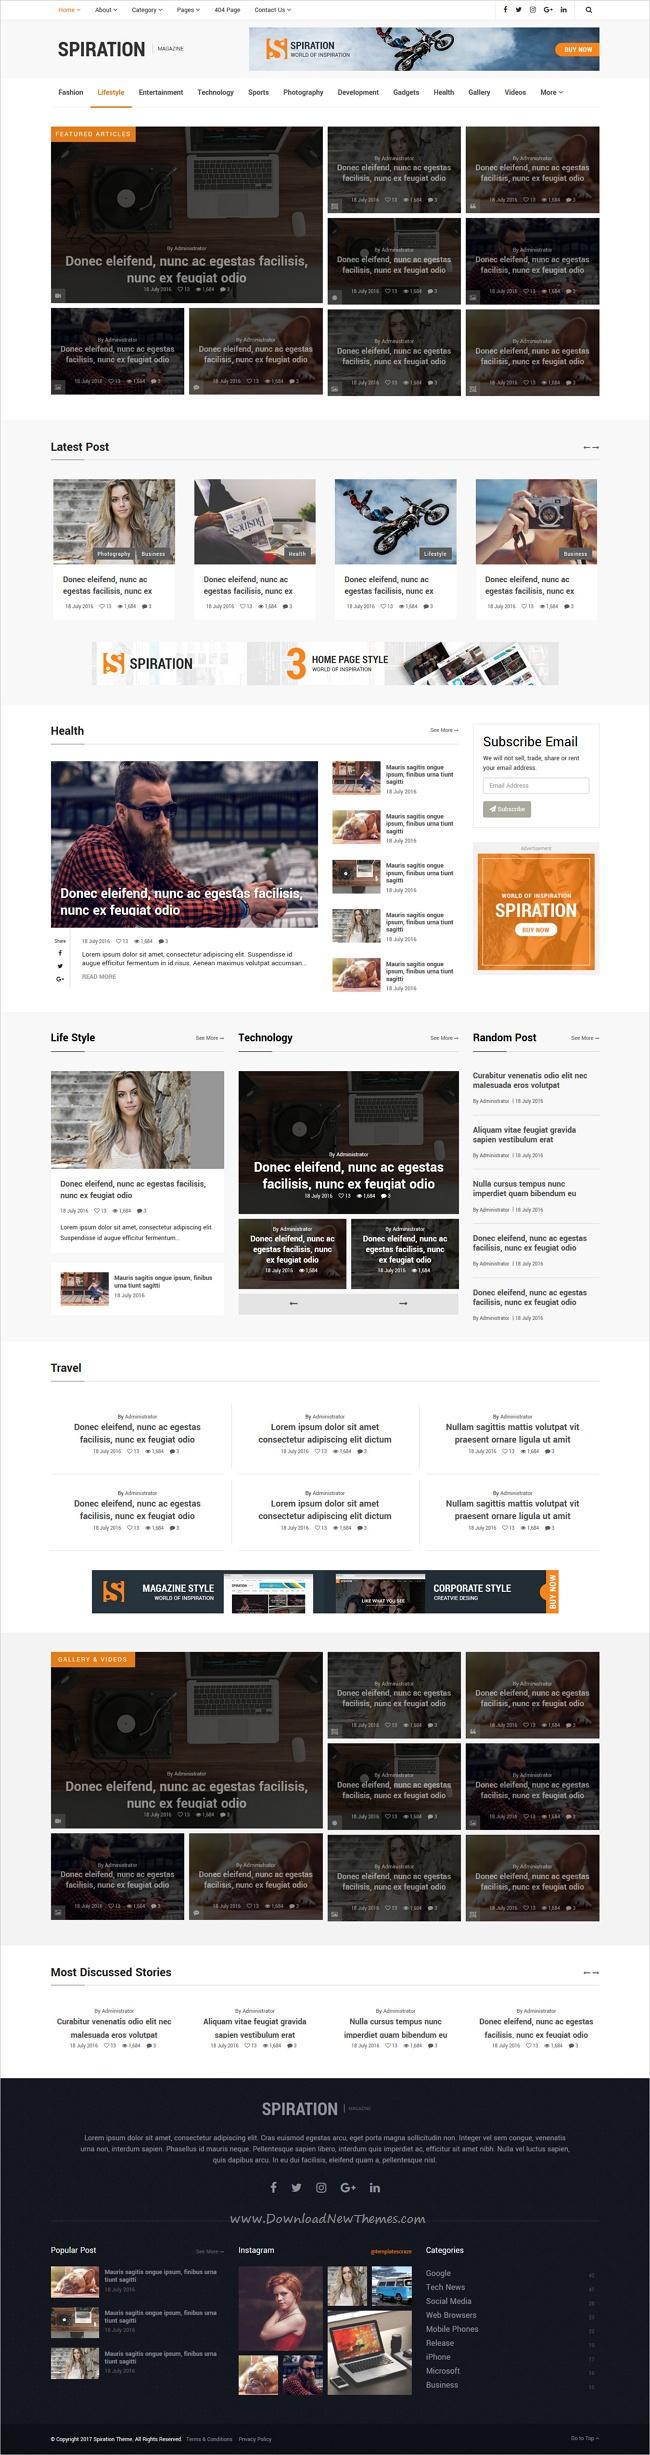 Unusual Html Magazine Template Gallery - Professional Resume ...